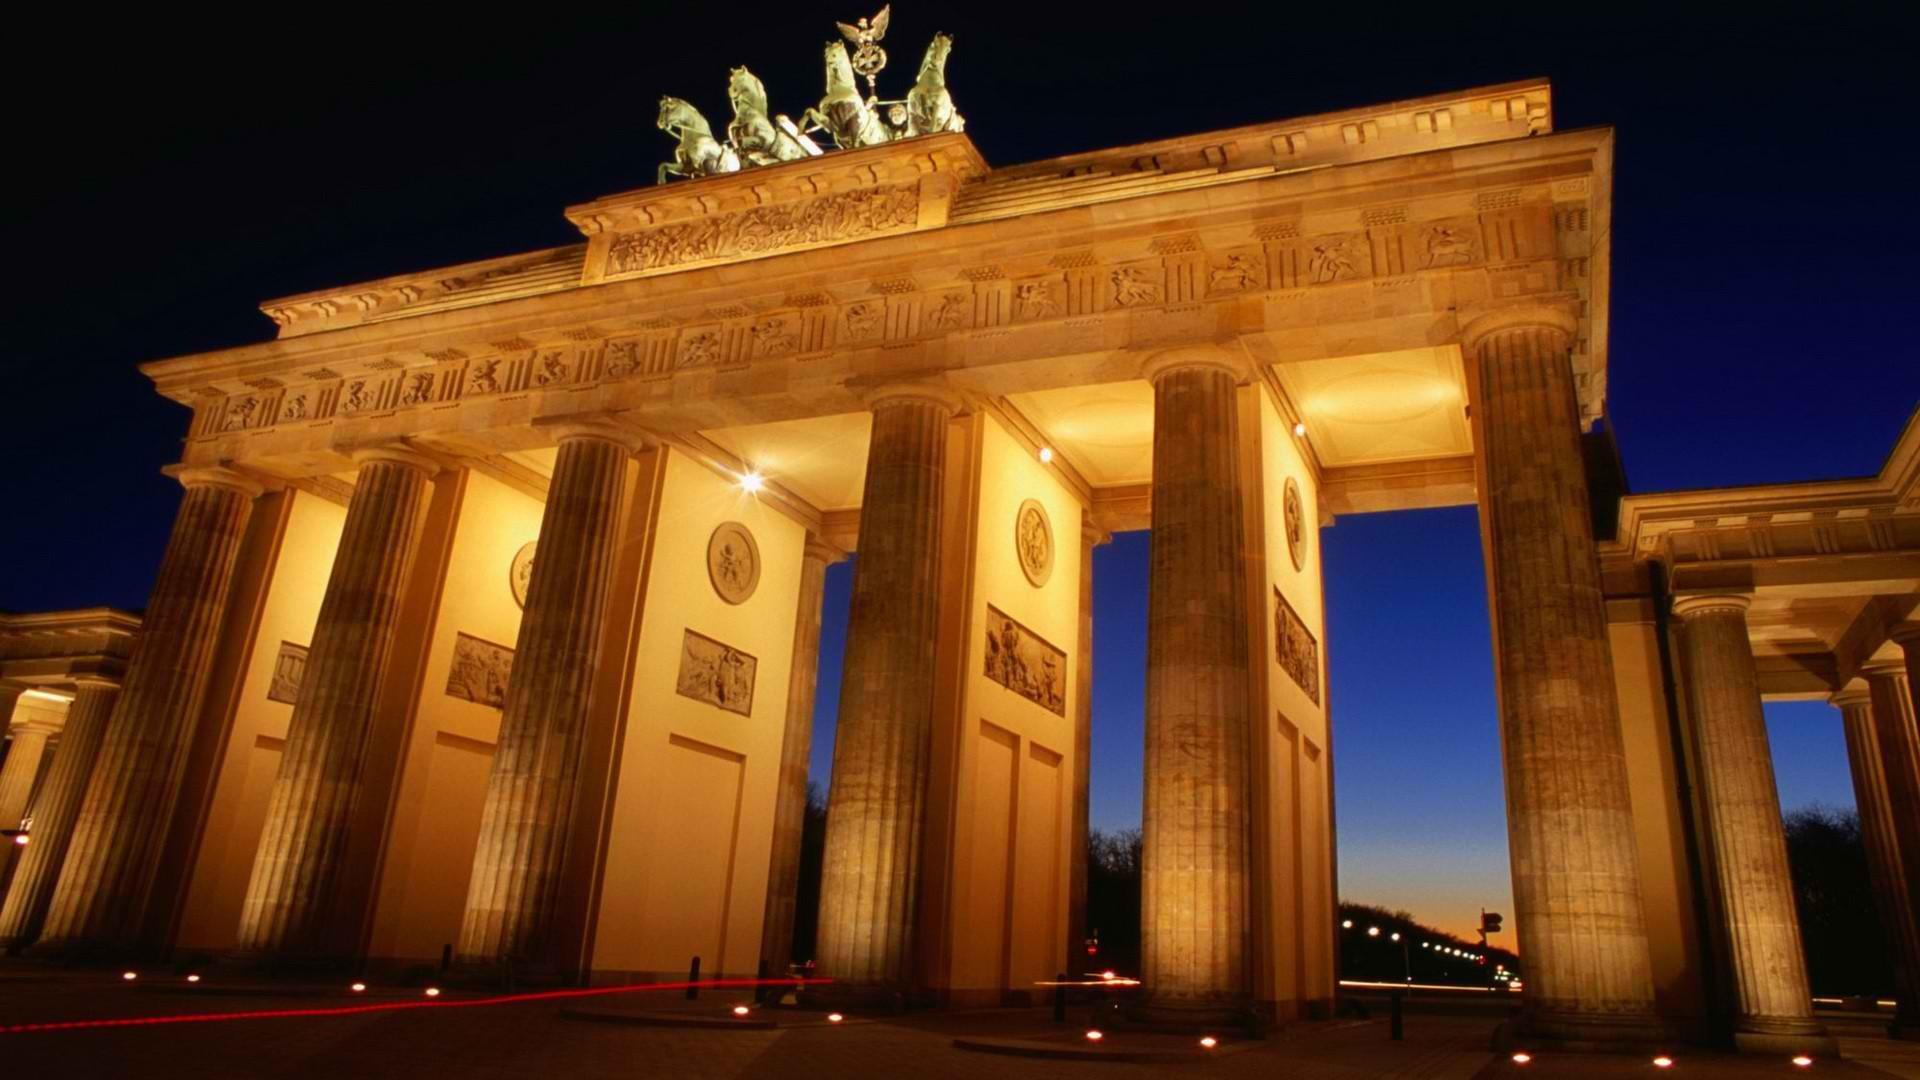 Brandenburg Gate HD Wallpaper 1920x1080 ID46103 1920x1080